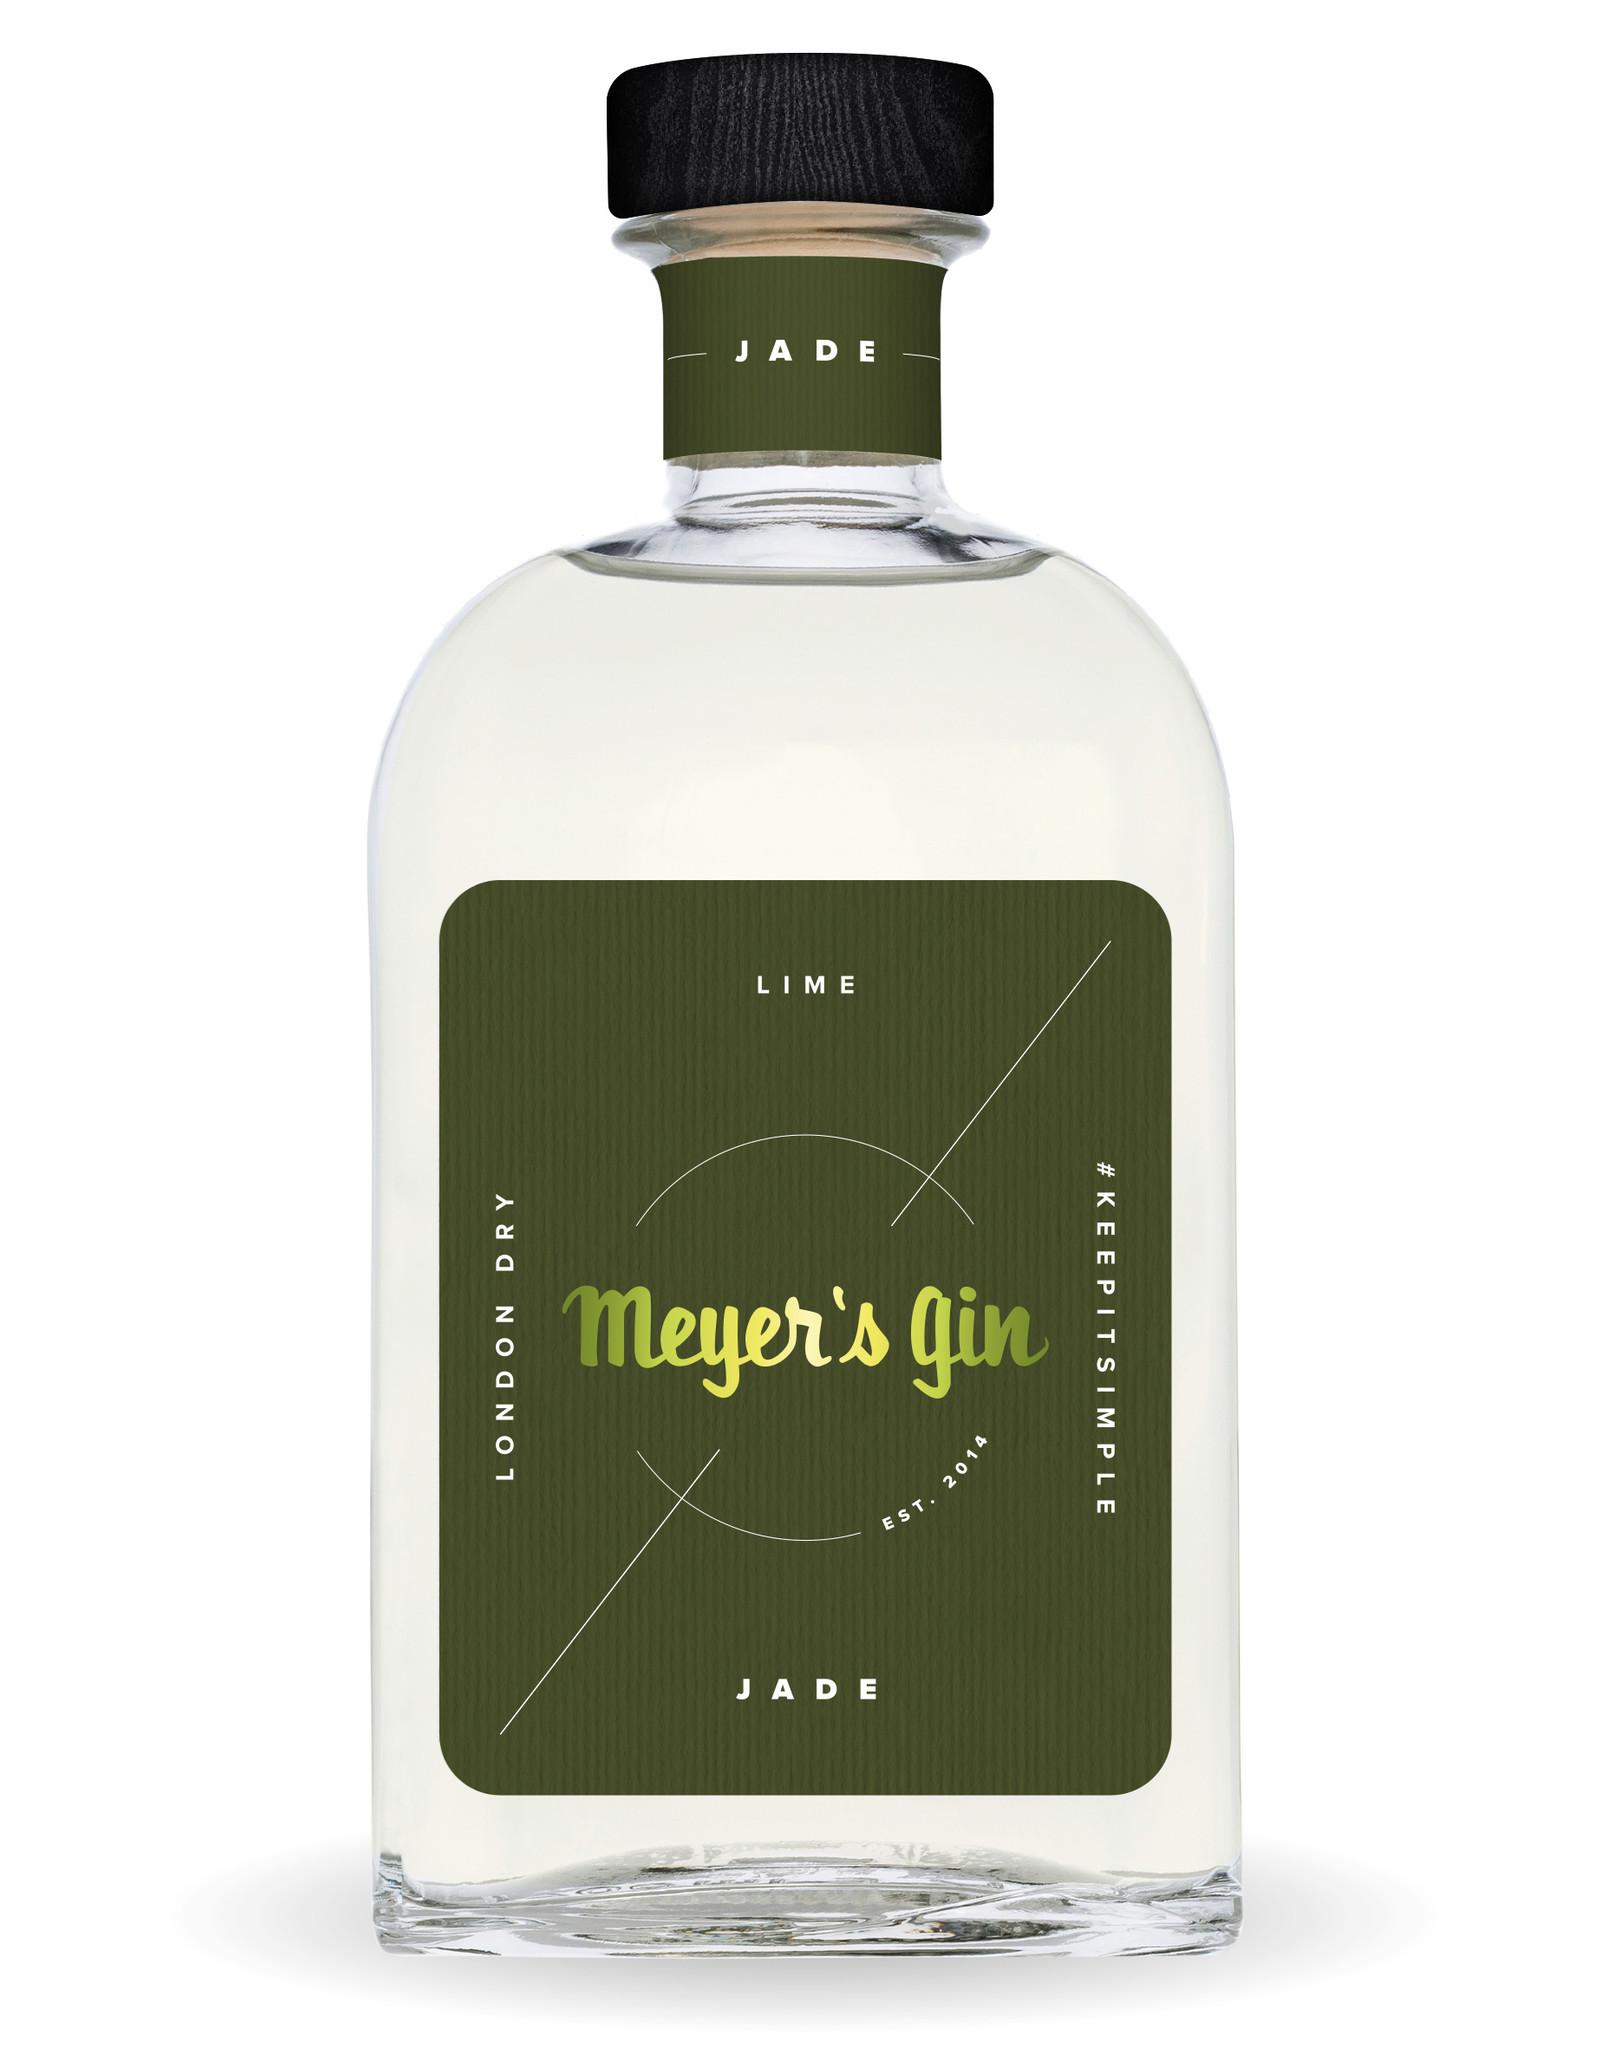 Meyer's Gin Meyer's ging jade 38% 50 cl